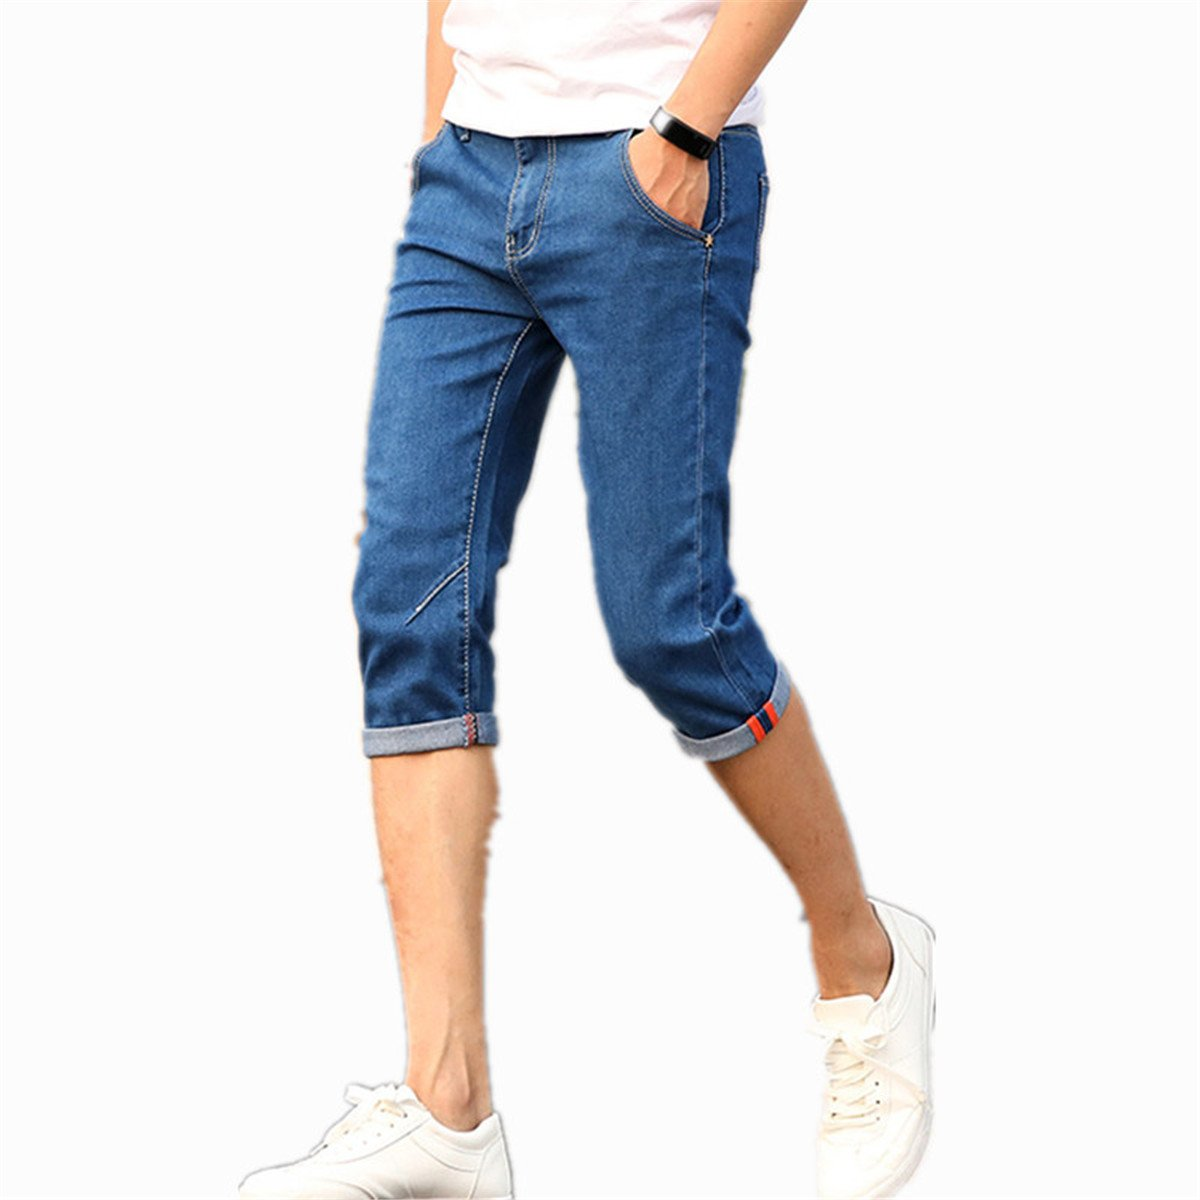 Mens Denim Shorts Good Quality Short Jeans Men Cotton Solid Straight Short Jeans Male Blue Casual Short Jeans